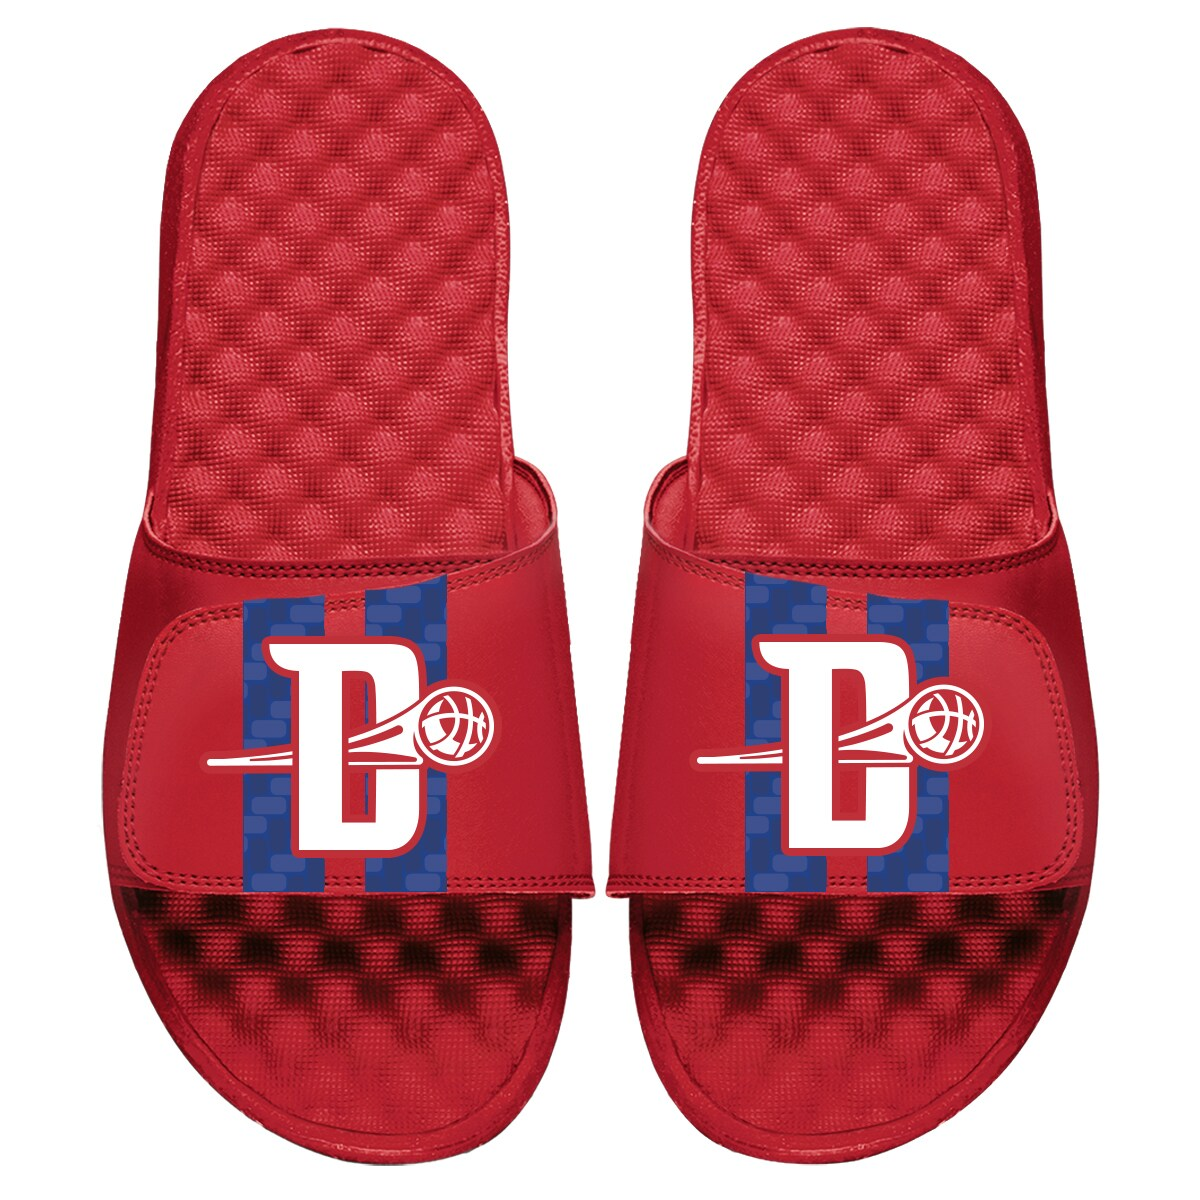 Detroit Pistons ISlide 2019/20 City Edition Slide Sandals - Red